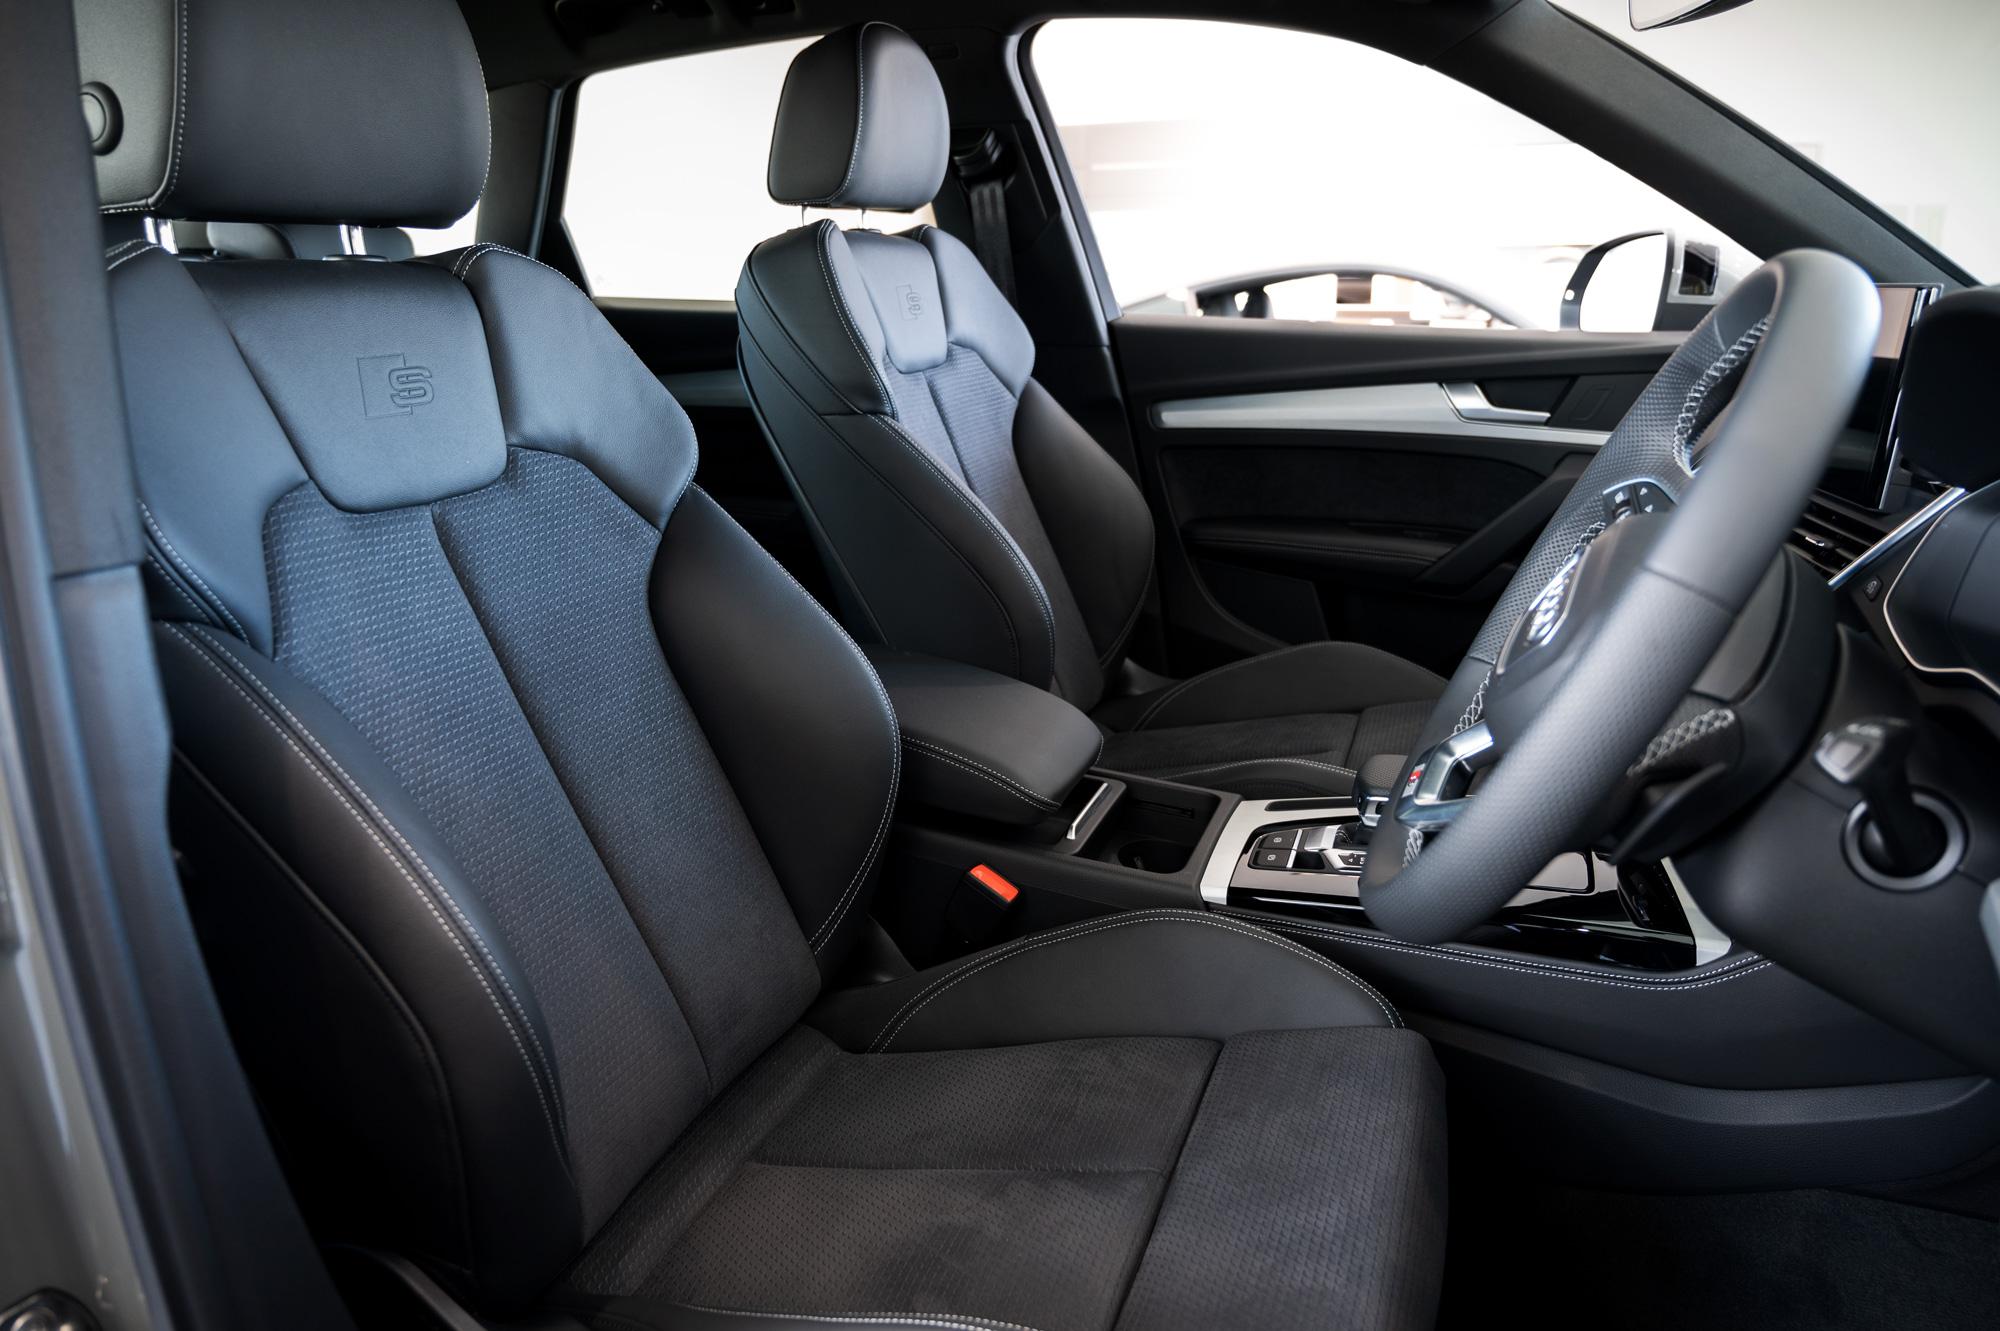 Audi Q5 S lineレザーのコンビネーションスポーツシート